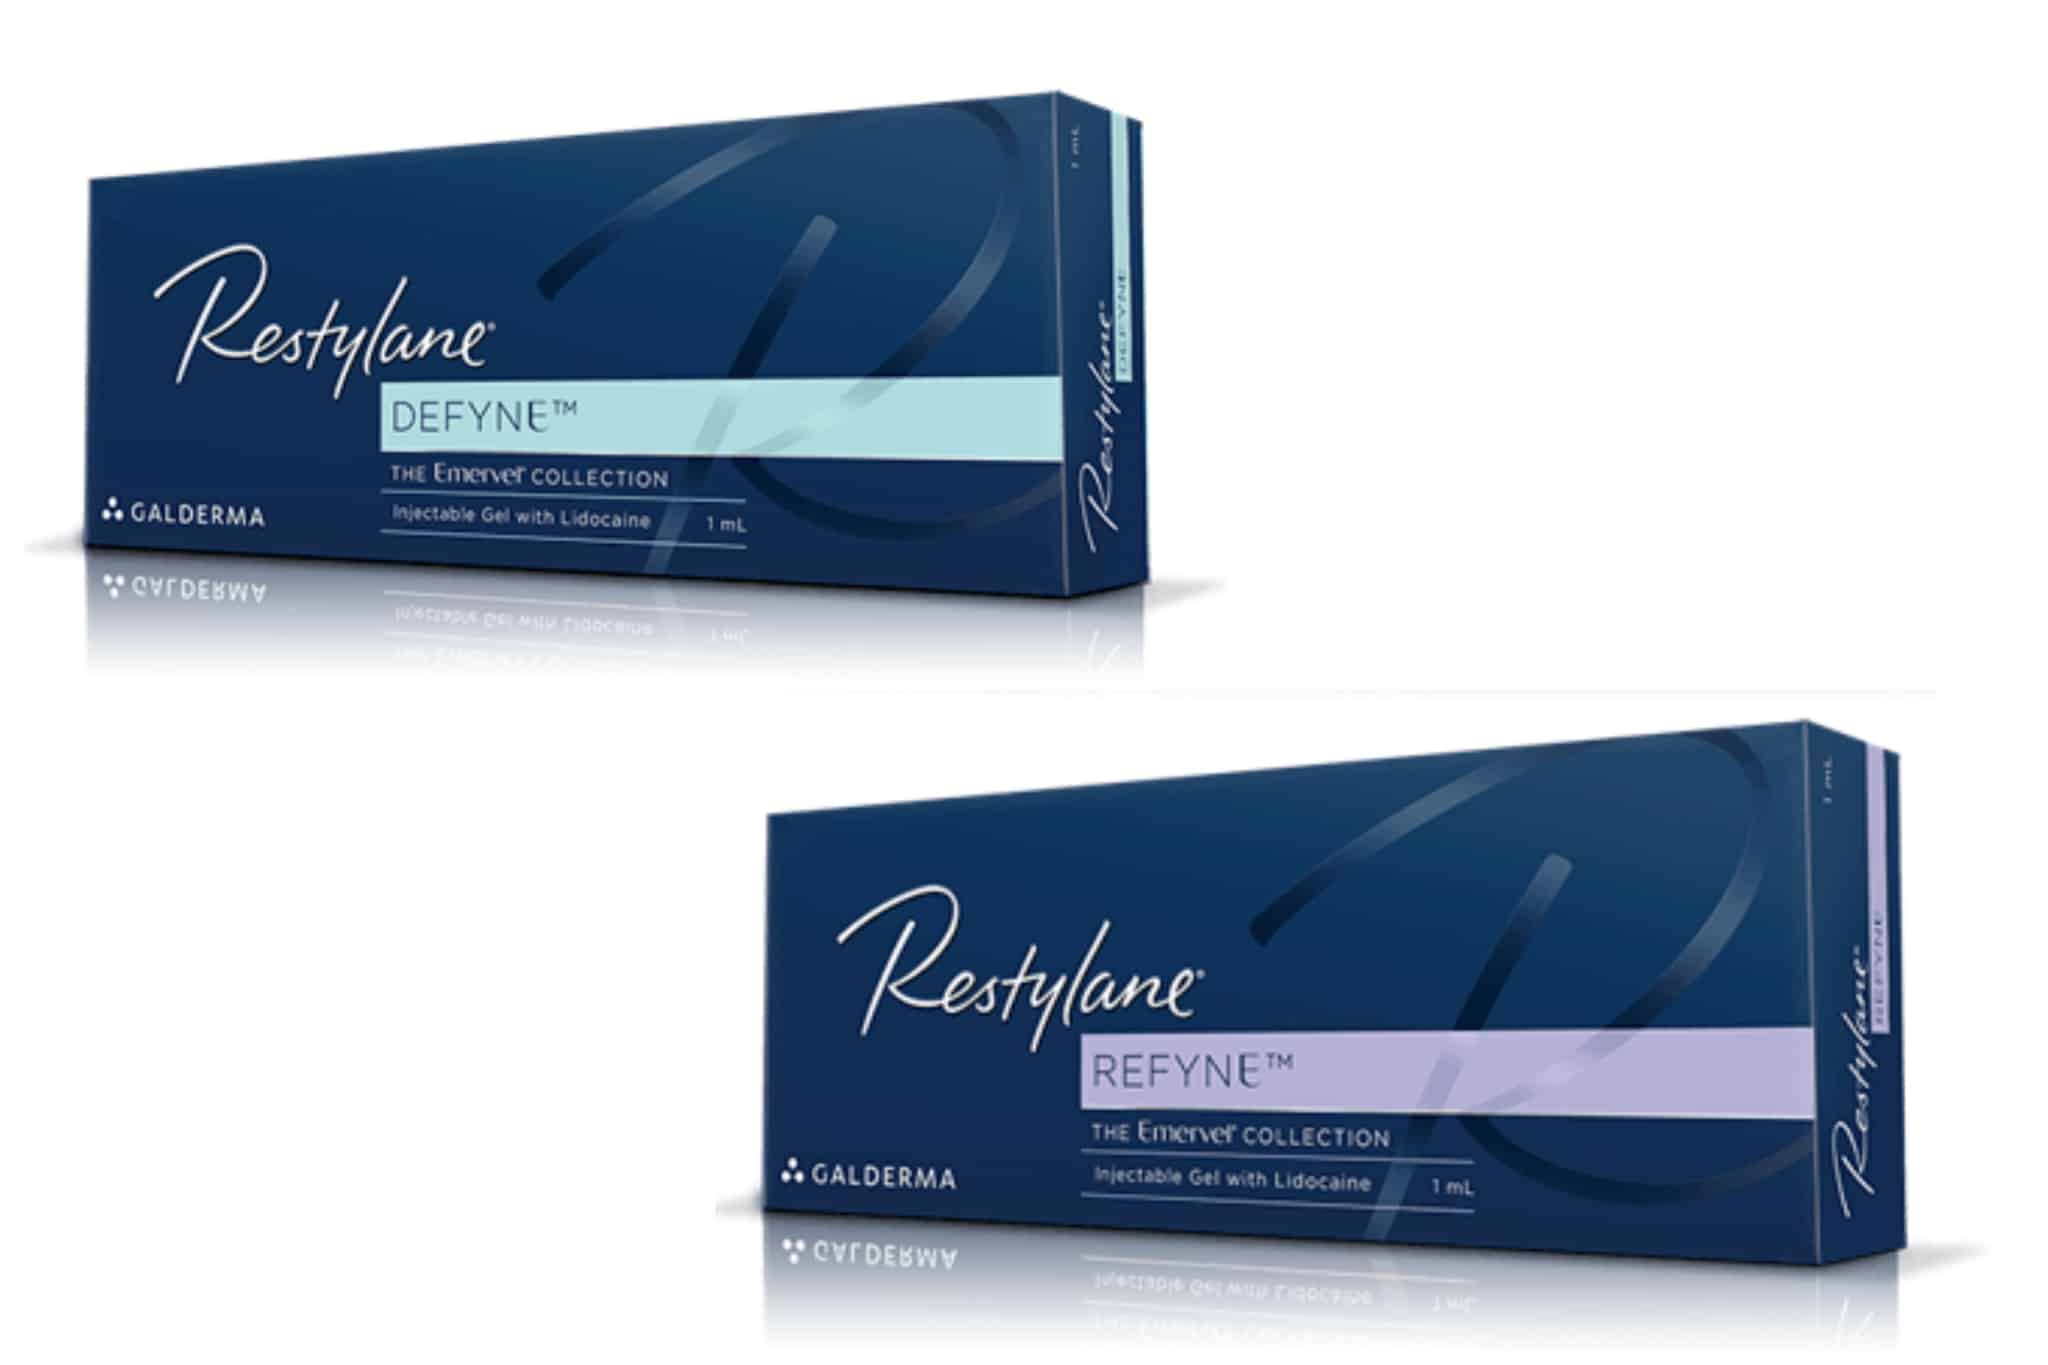 Restylane Defyne Refyne Cosmetic Injectables